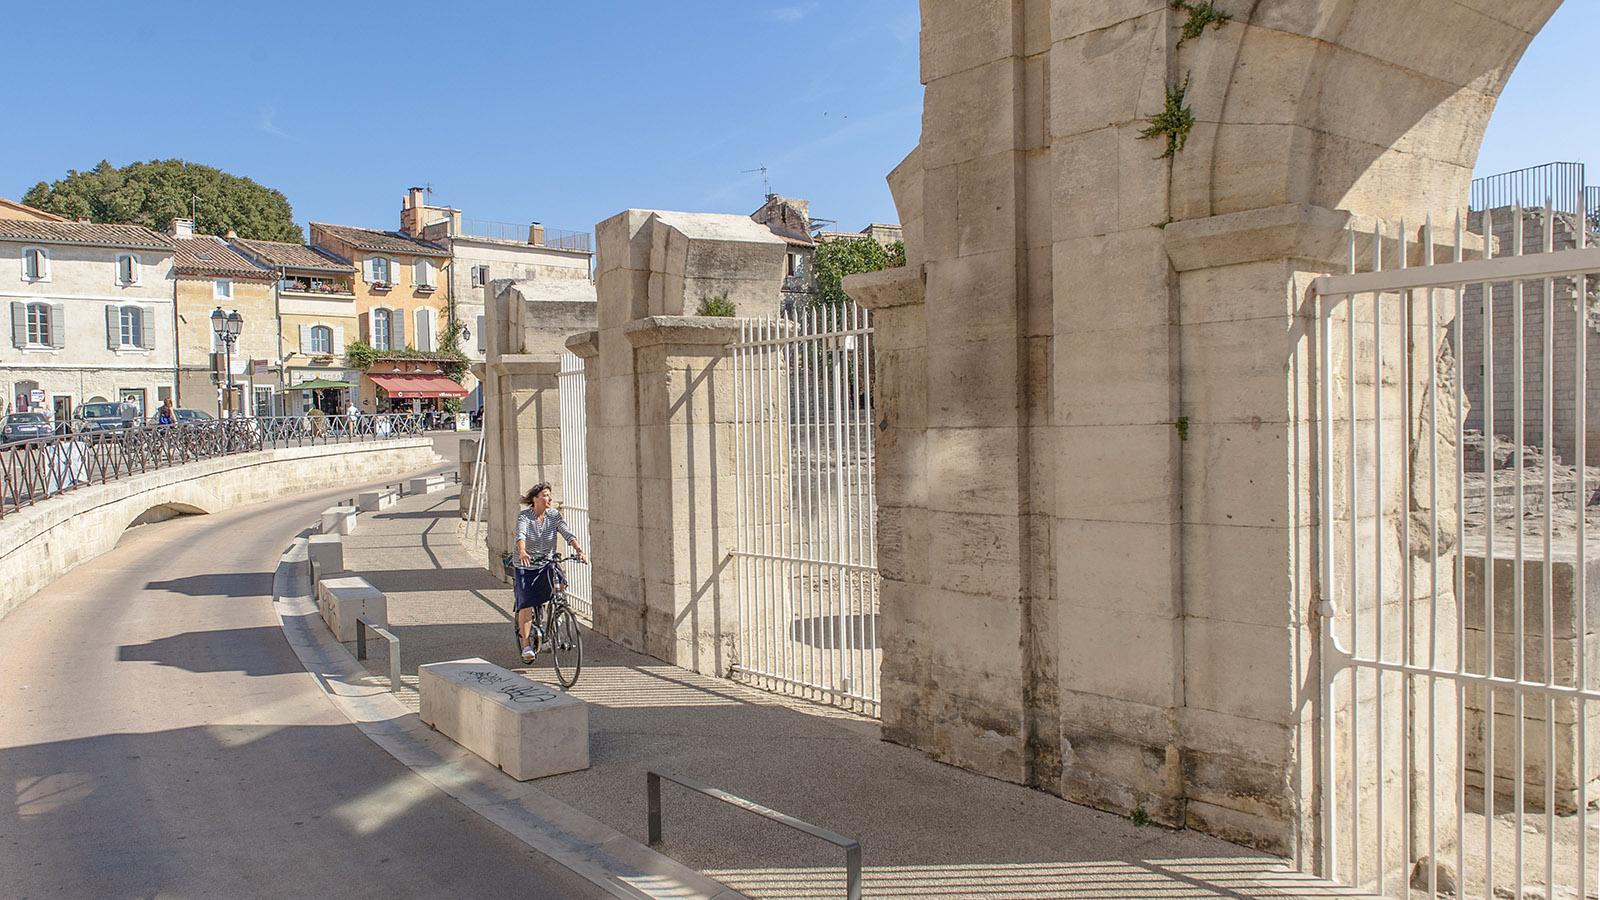 Arles: Die Rue de la Calade führt am antiken Theater entlang. Foto: Hilke Maunder